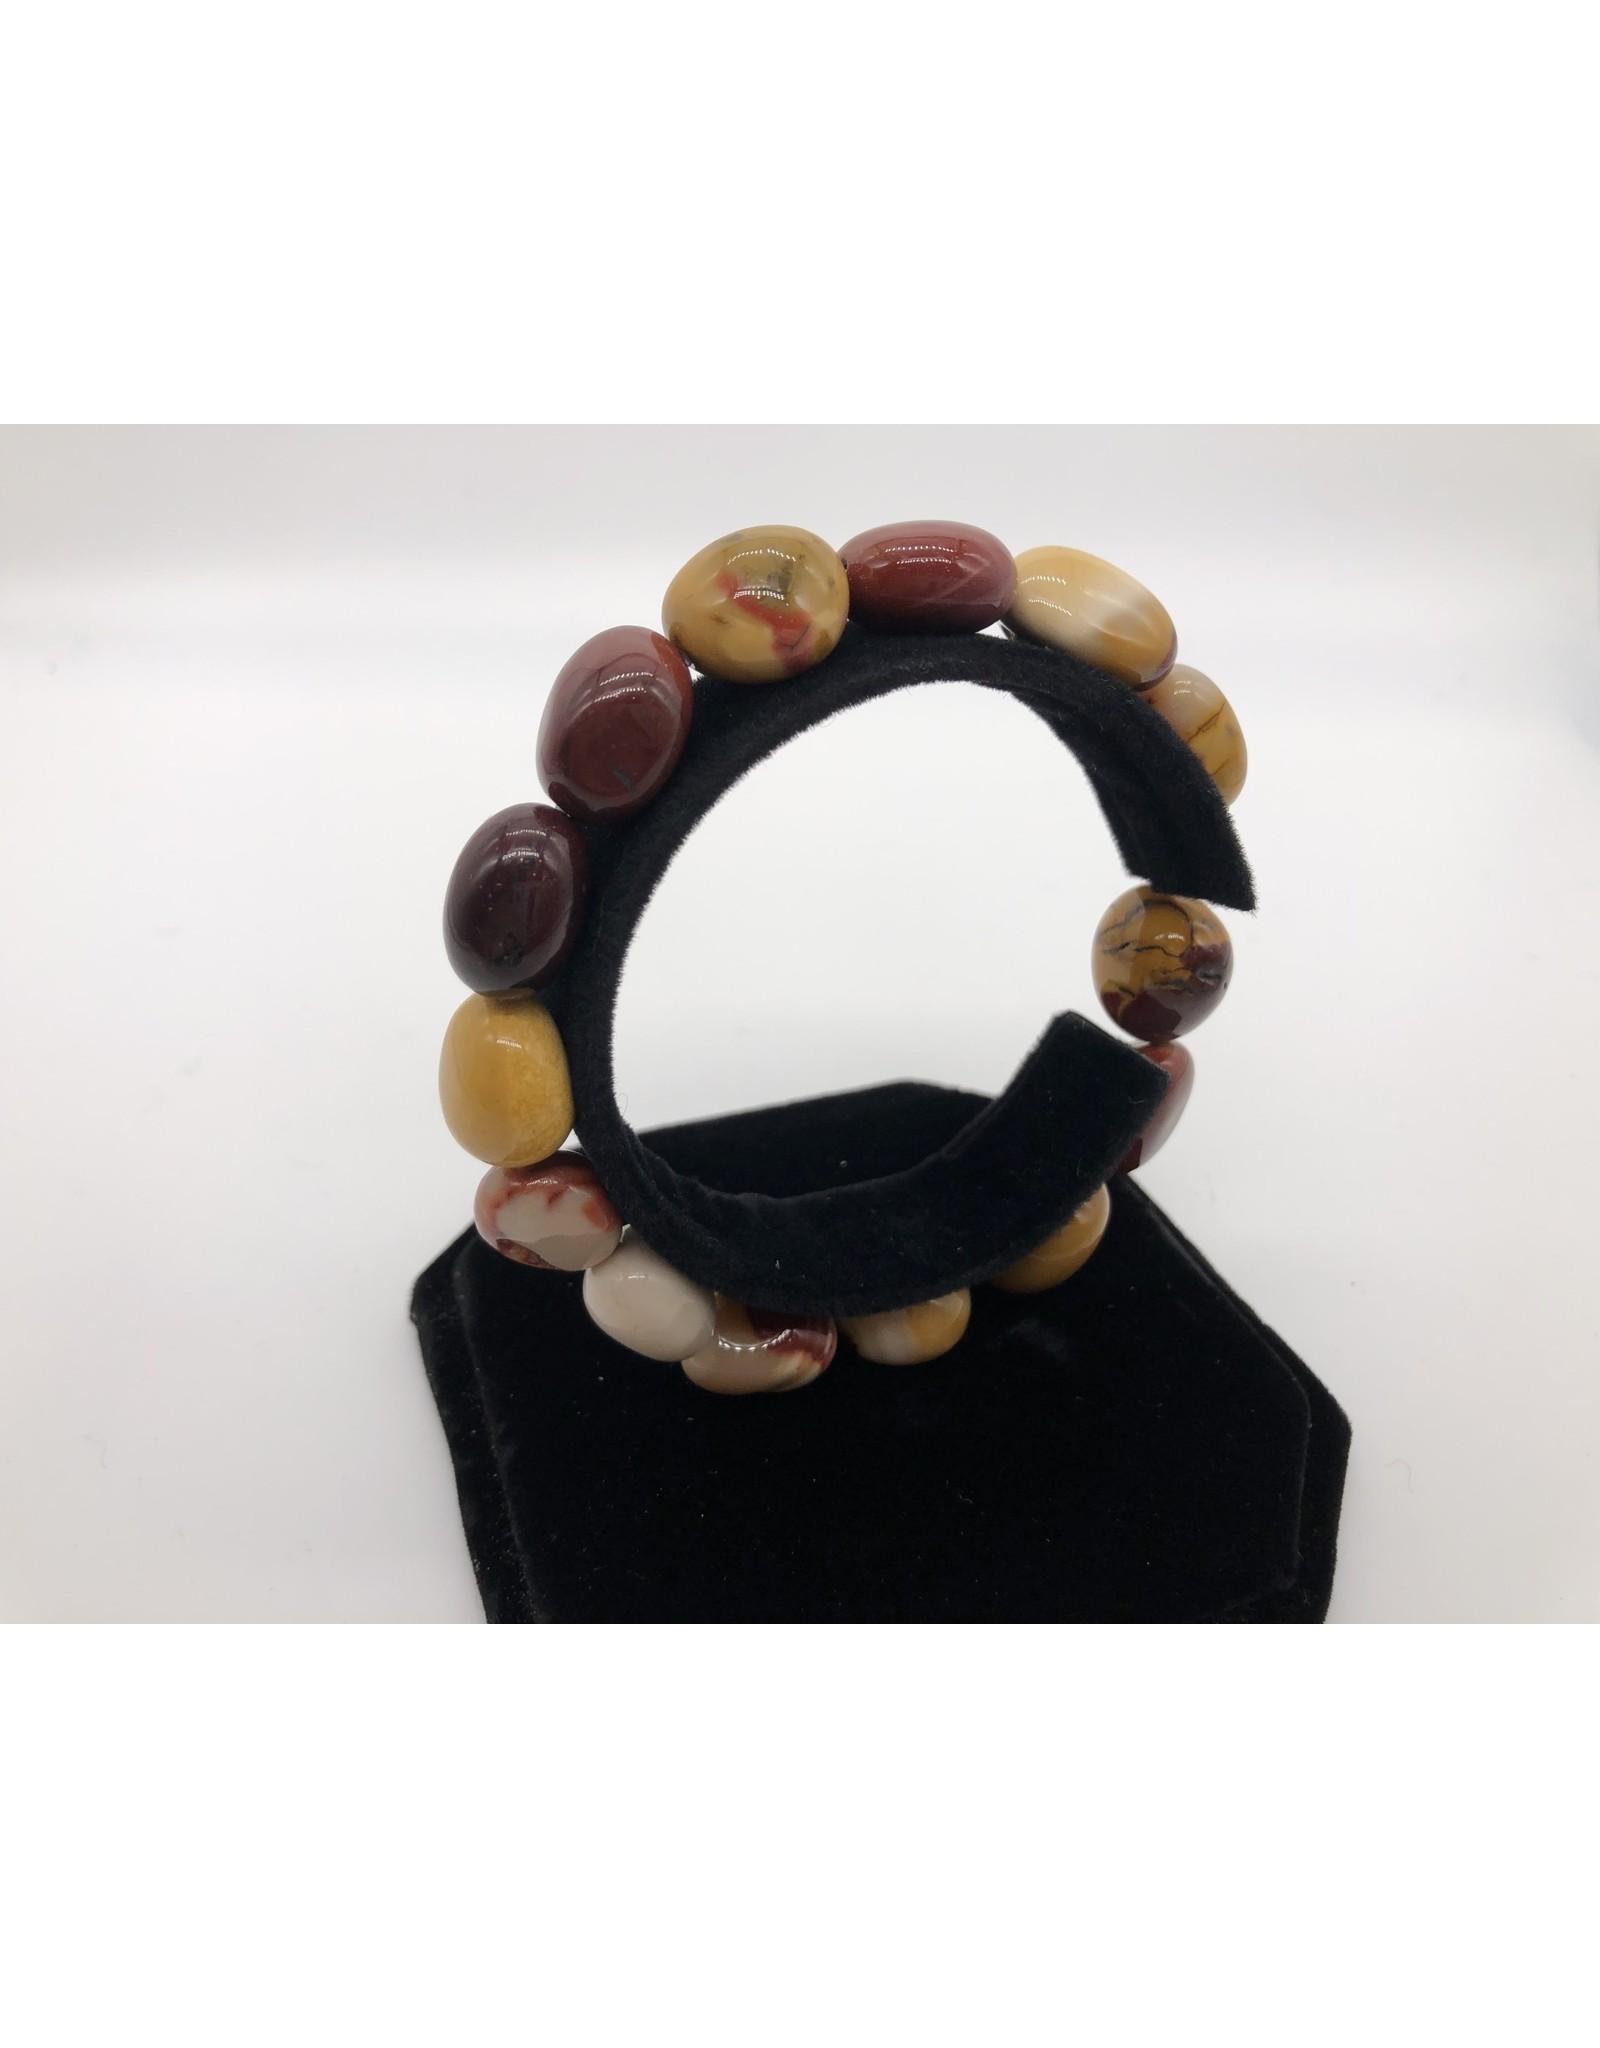 Mookaite Tumbled Gemstone Bracelet